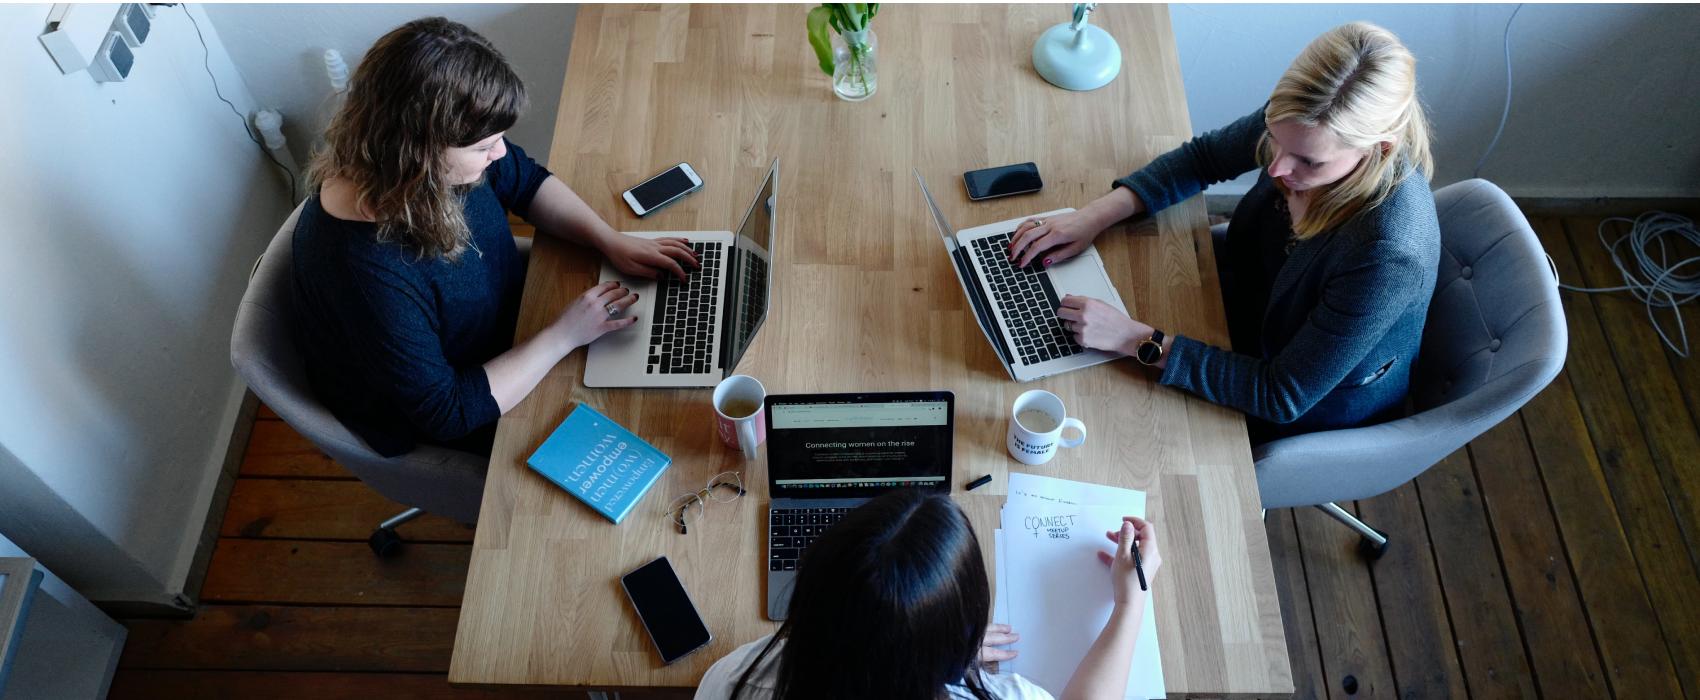 transformation-digitale-accompagner-les-salariés